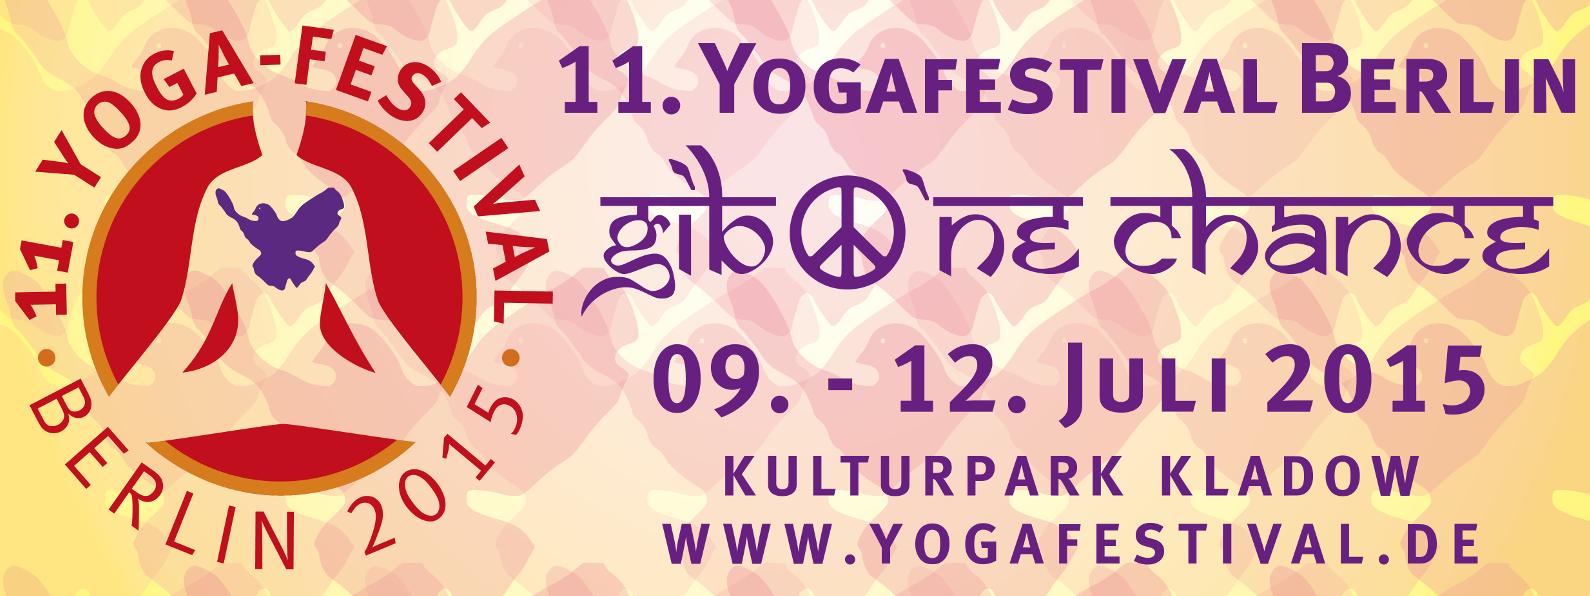 Banner Yogafestival Berlin 2015